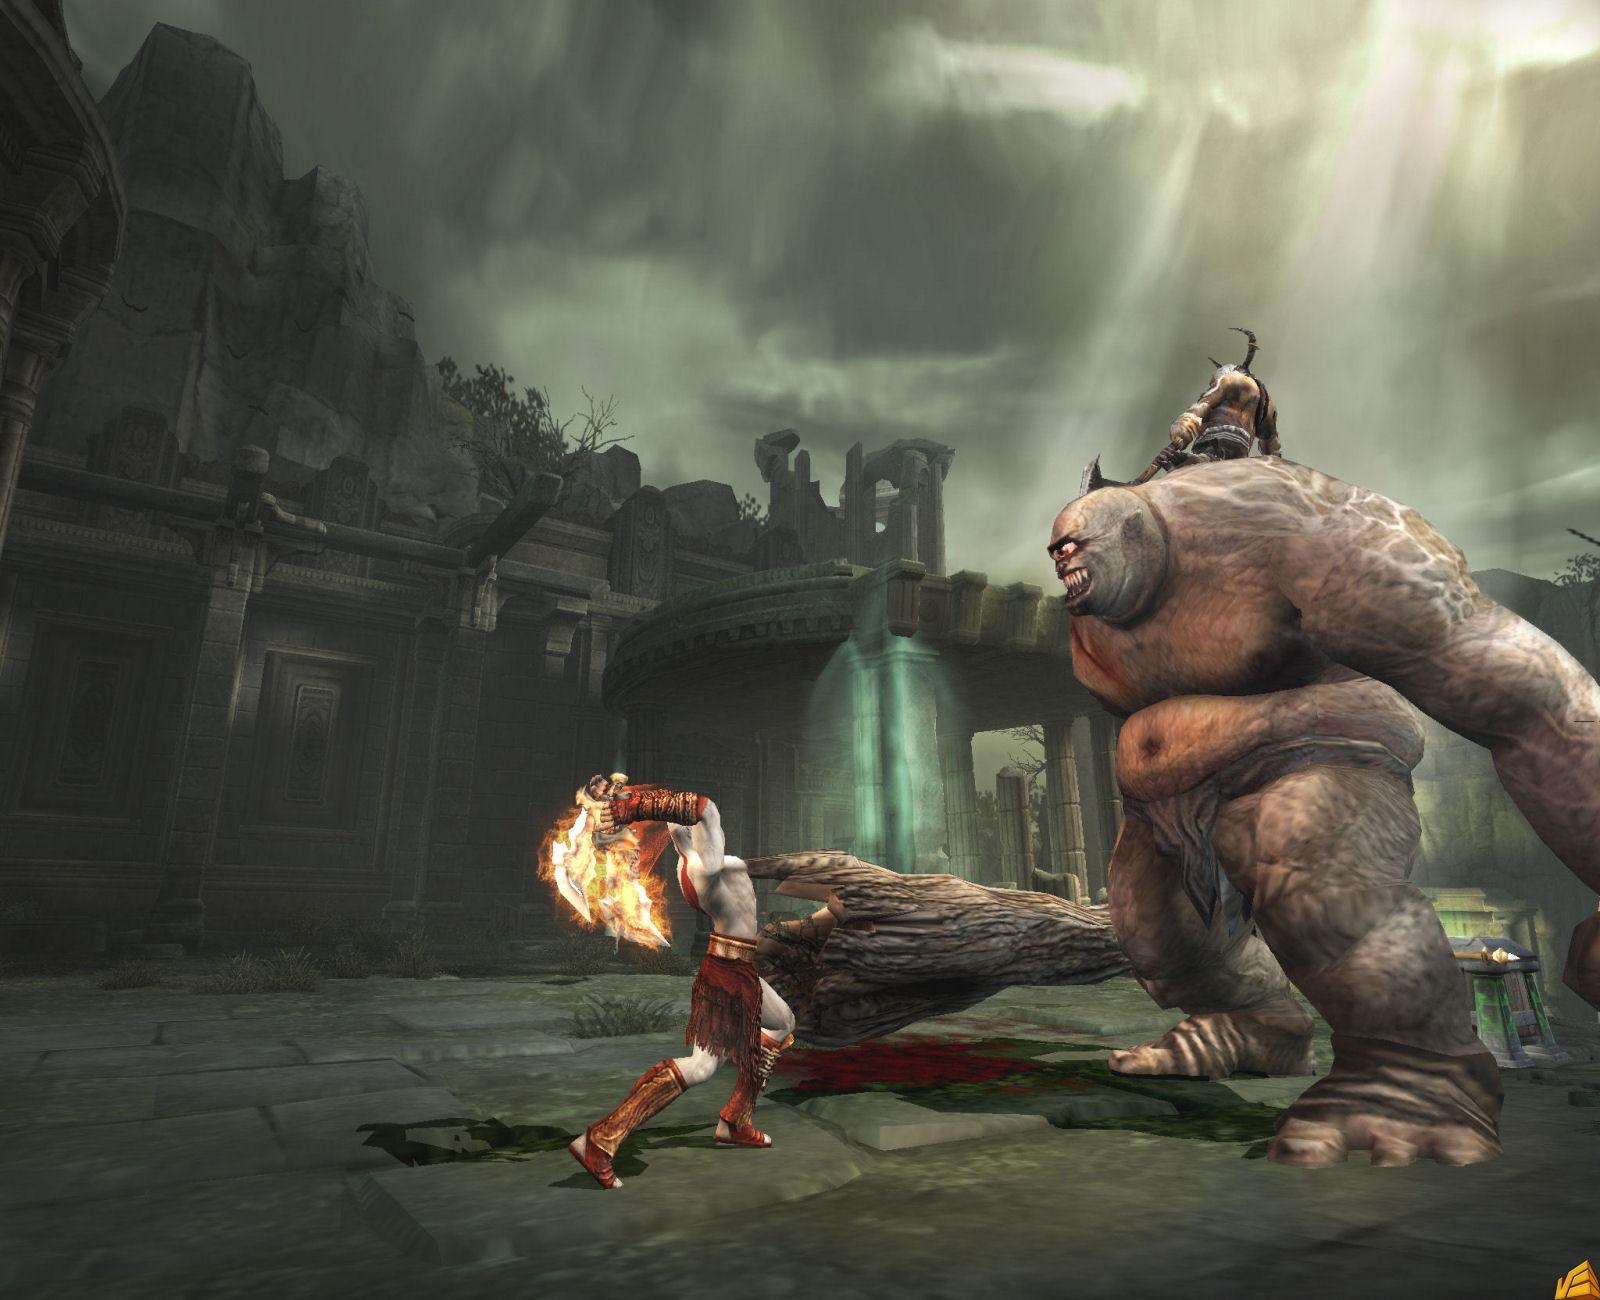 Free download pc game god of war 1 full version top full games.